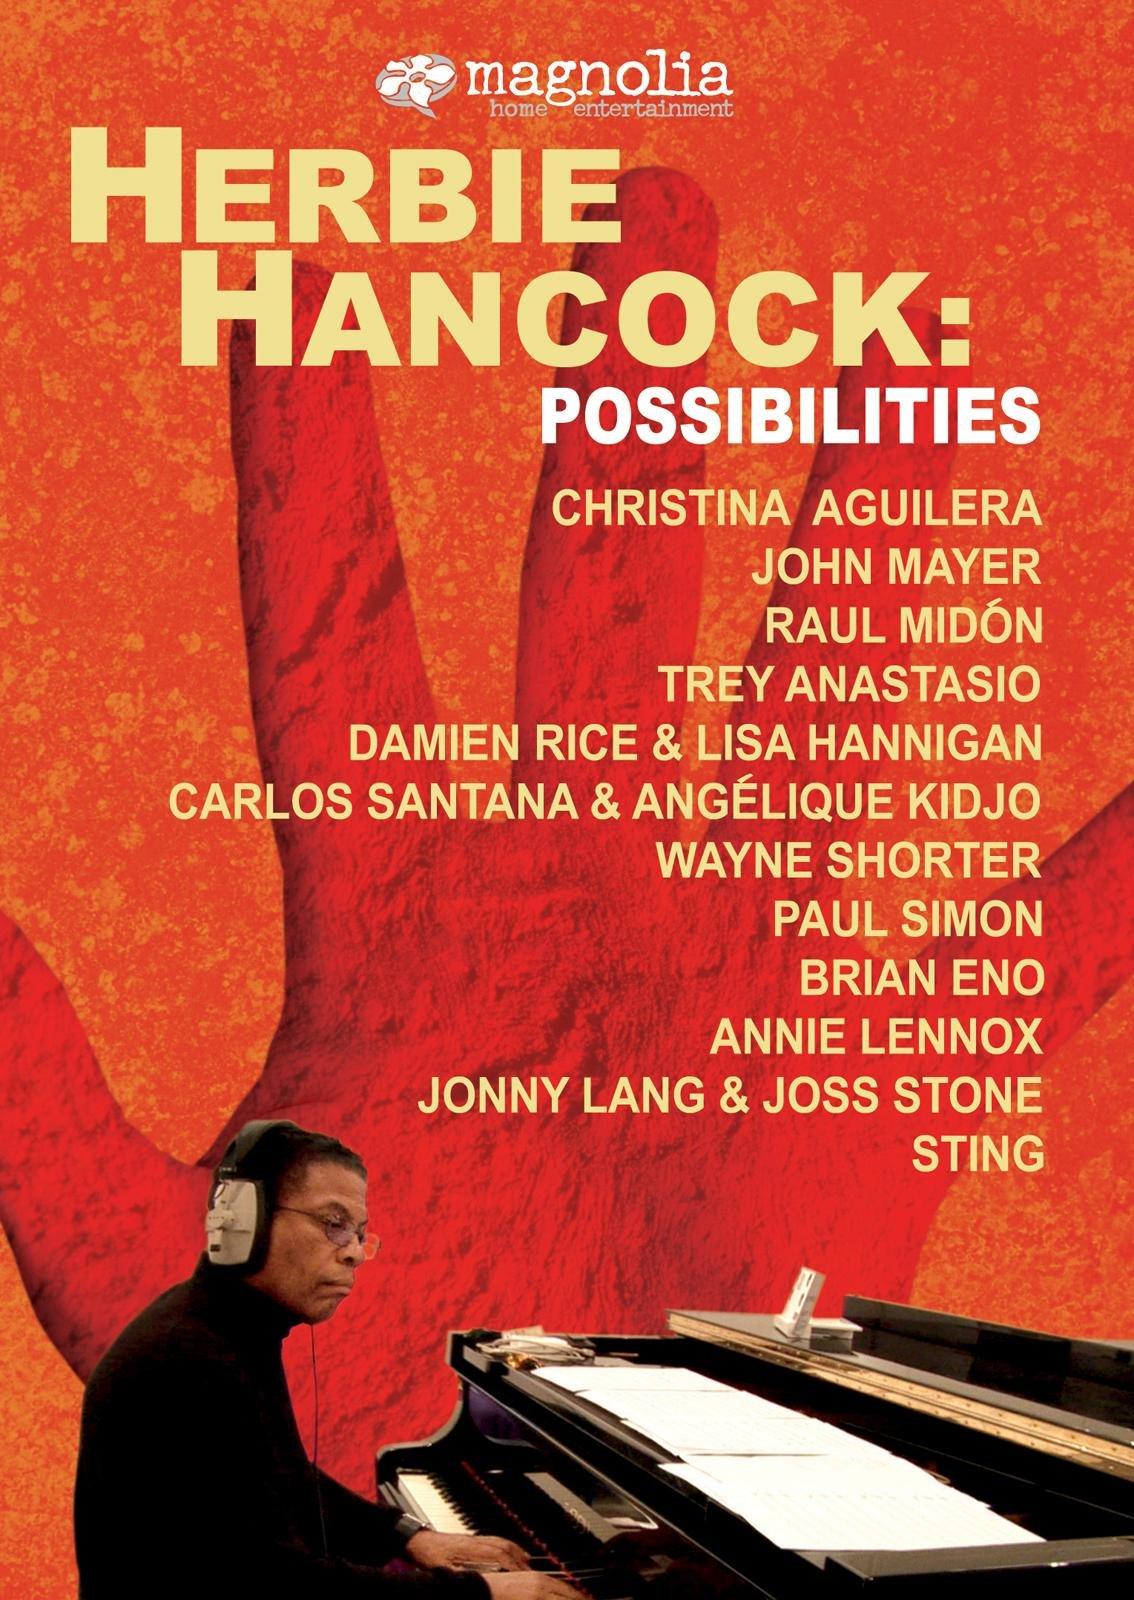 Designer deals club for hancock - Amazon Com Herbie Hancock Possibilities Doug Biro Jon Fine Magnolia Pictures Amazon Digital Services Llc